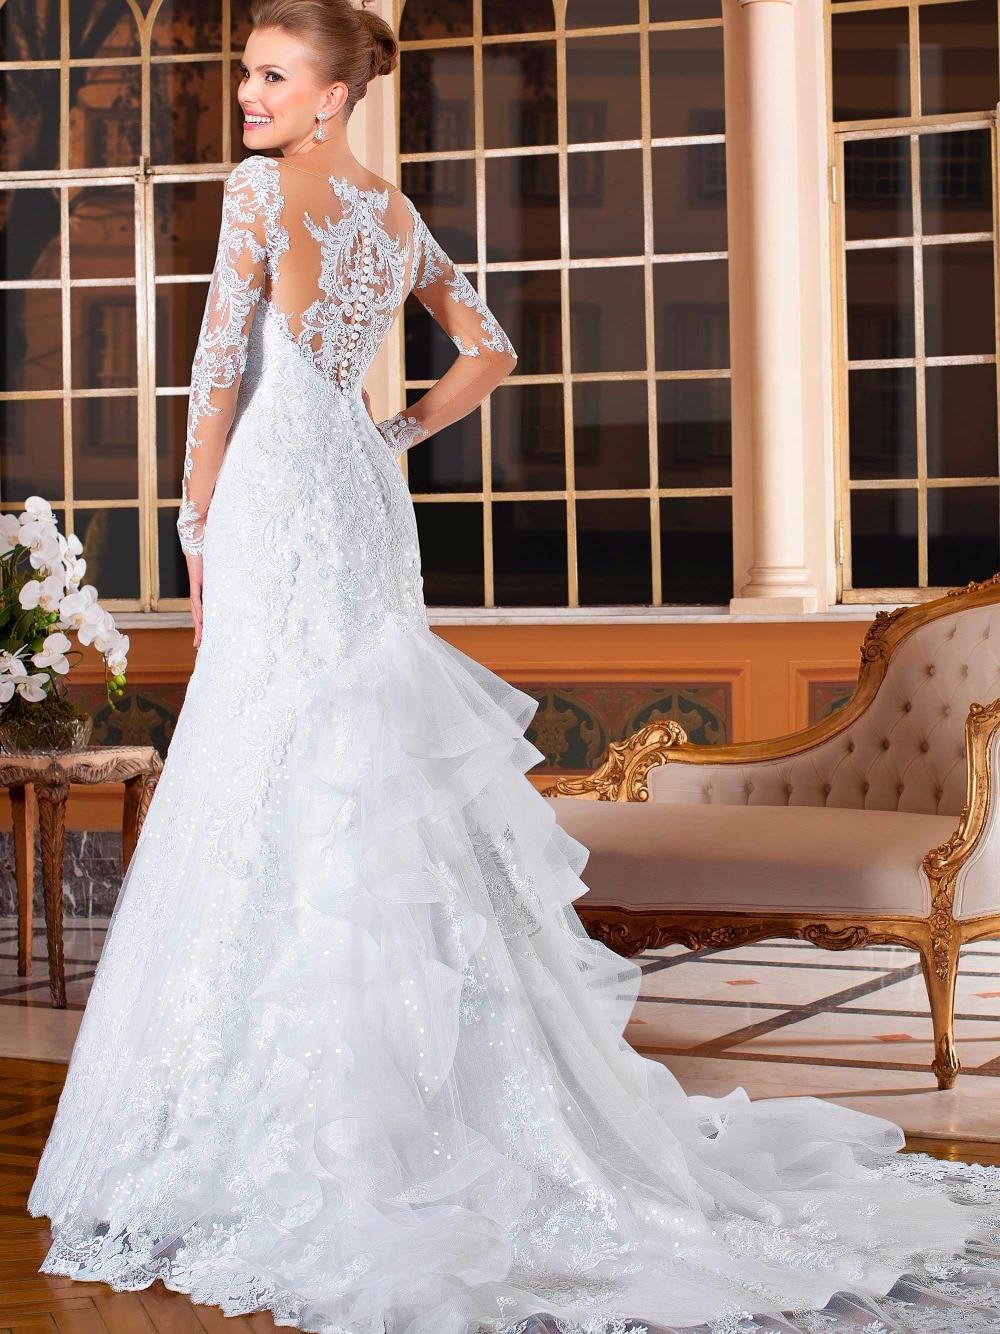 Fancy Mermaid Wedding Dresses - Missy Dress